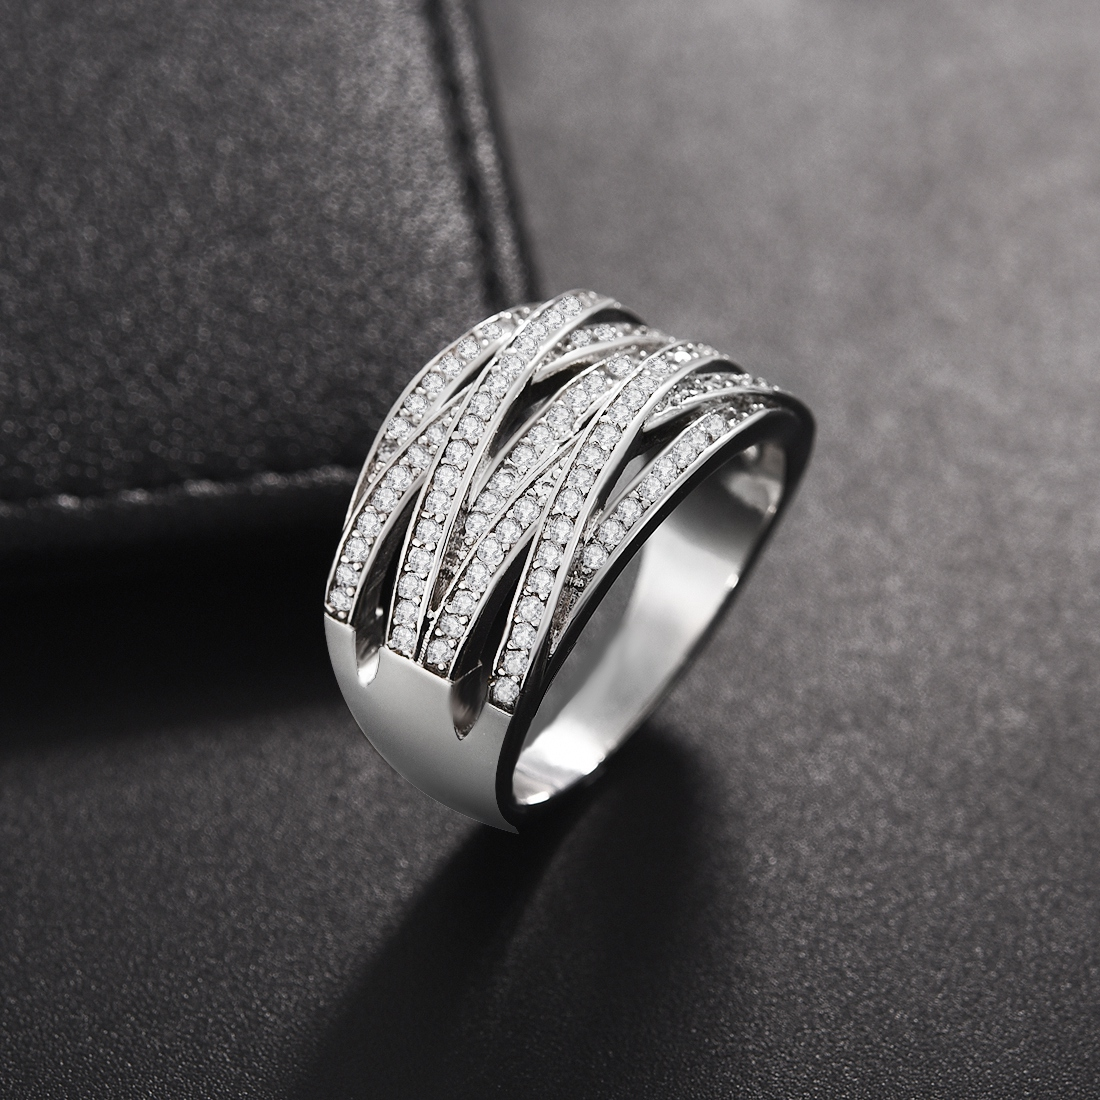 2019 New CZ Zircon Stone Silver Wedding Engagement Ring Hoop Earrings Jewelry Set For Women Fashion Jewelry